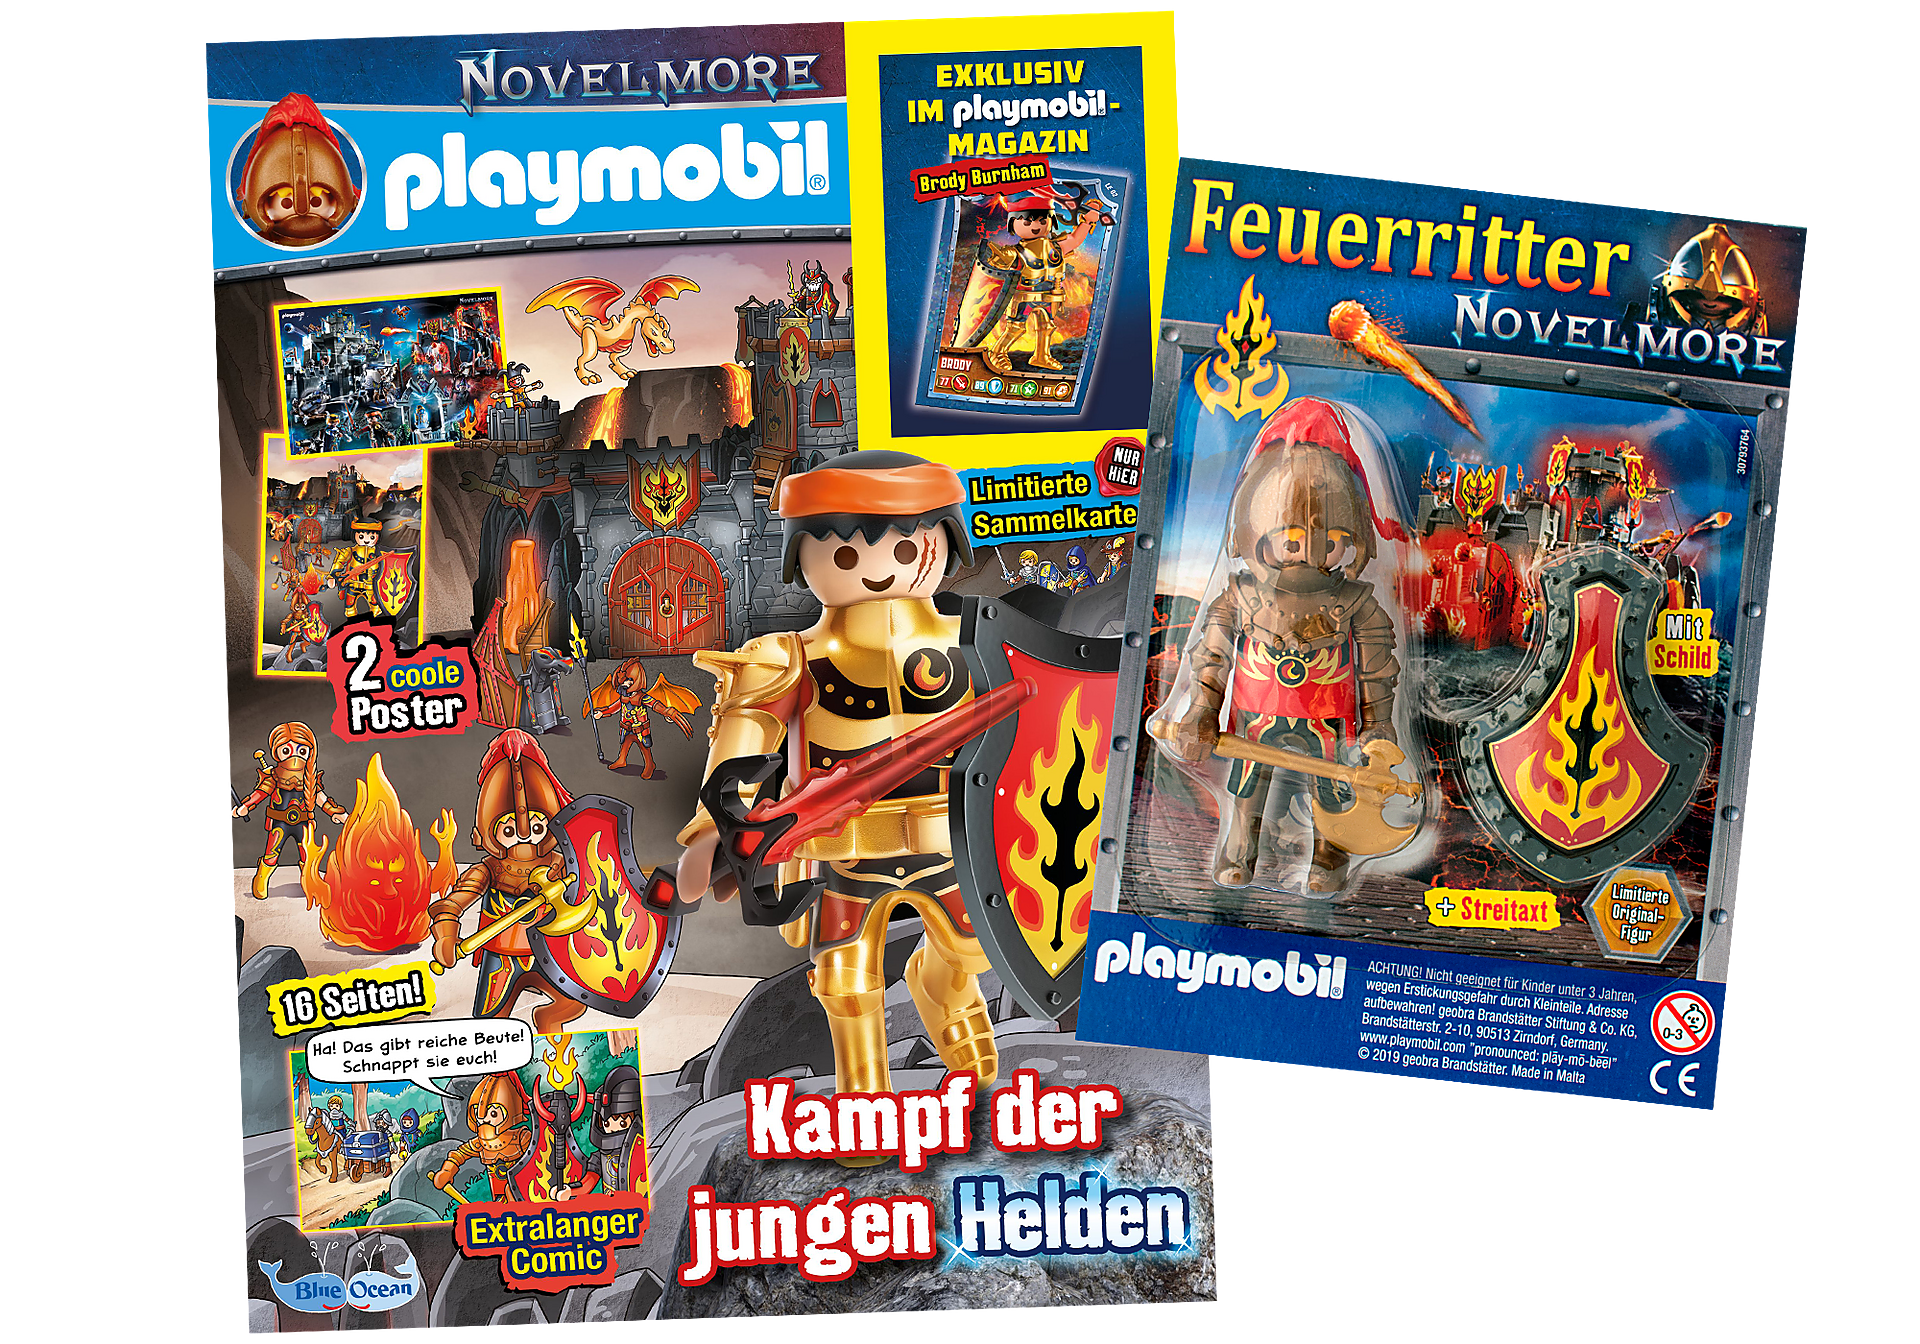 http://media.playmobil.com/i/playmobil/80640_product_detail/PLAYMOBIL-Magazin Blau 9/2019 (Heft 75)